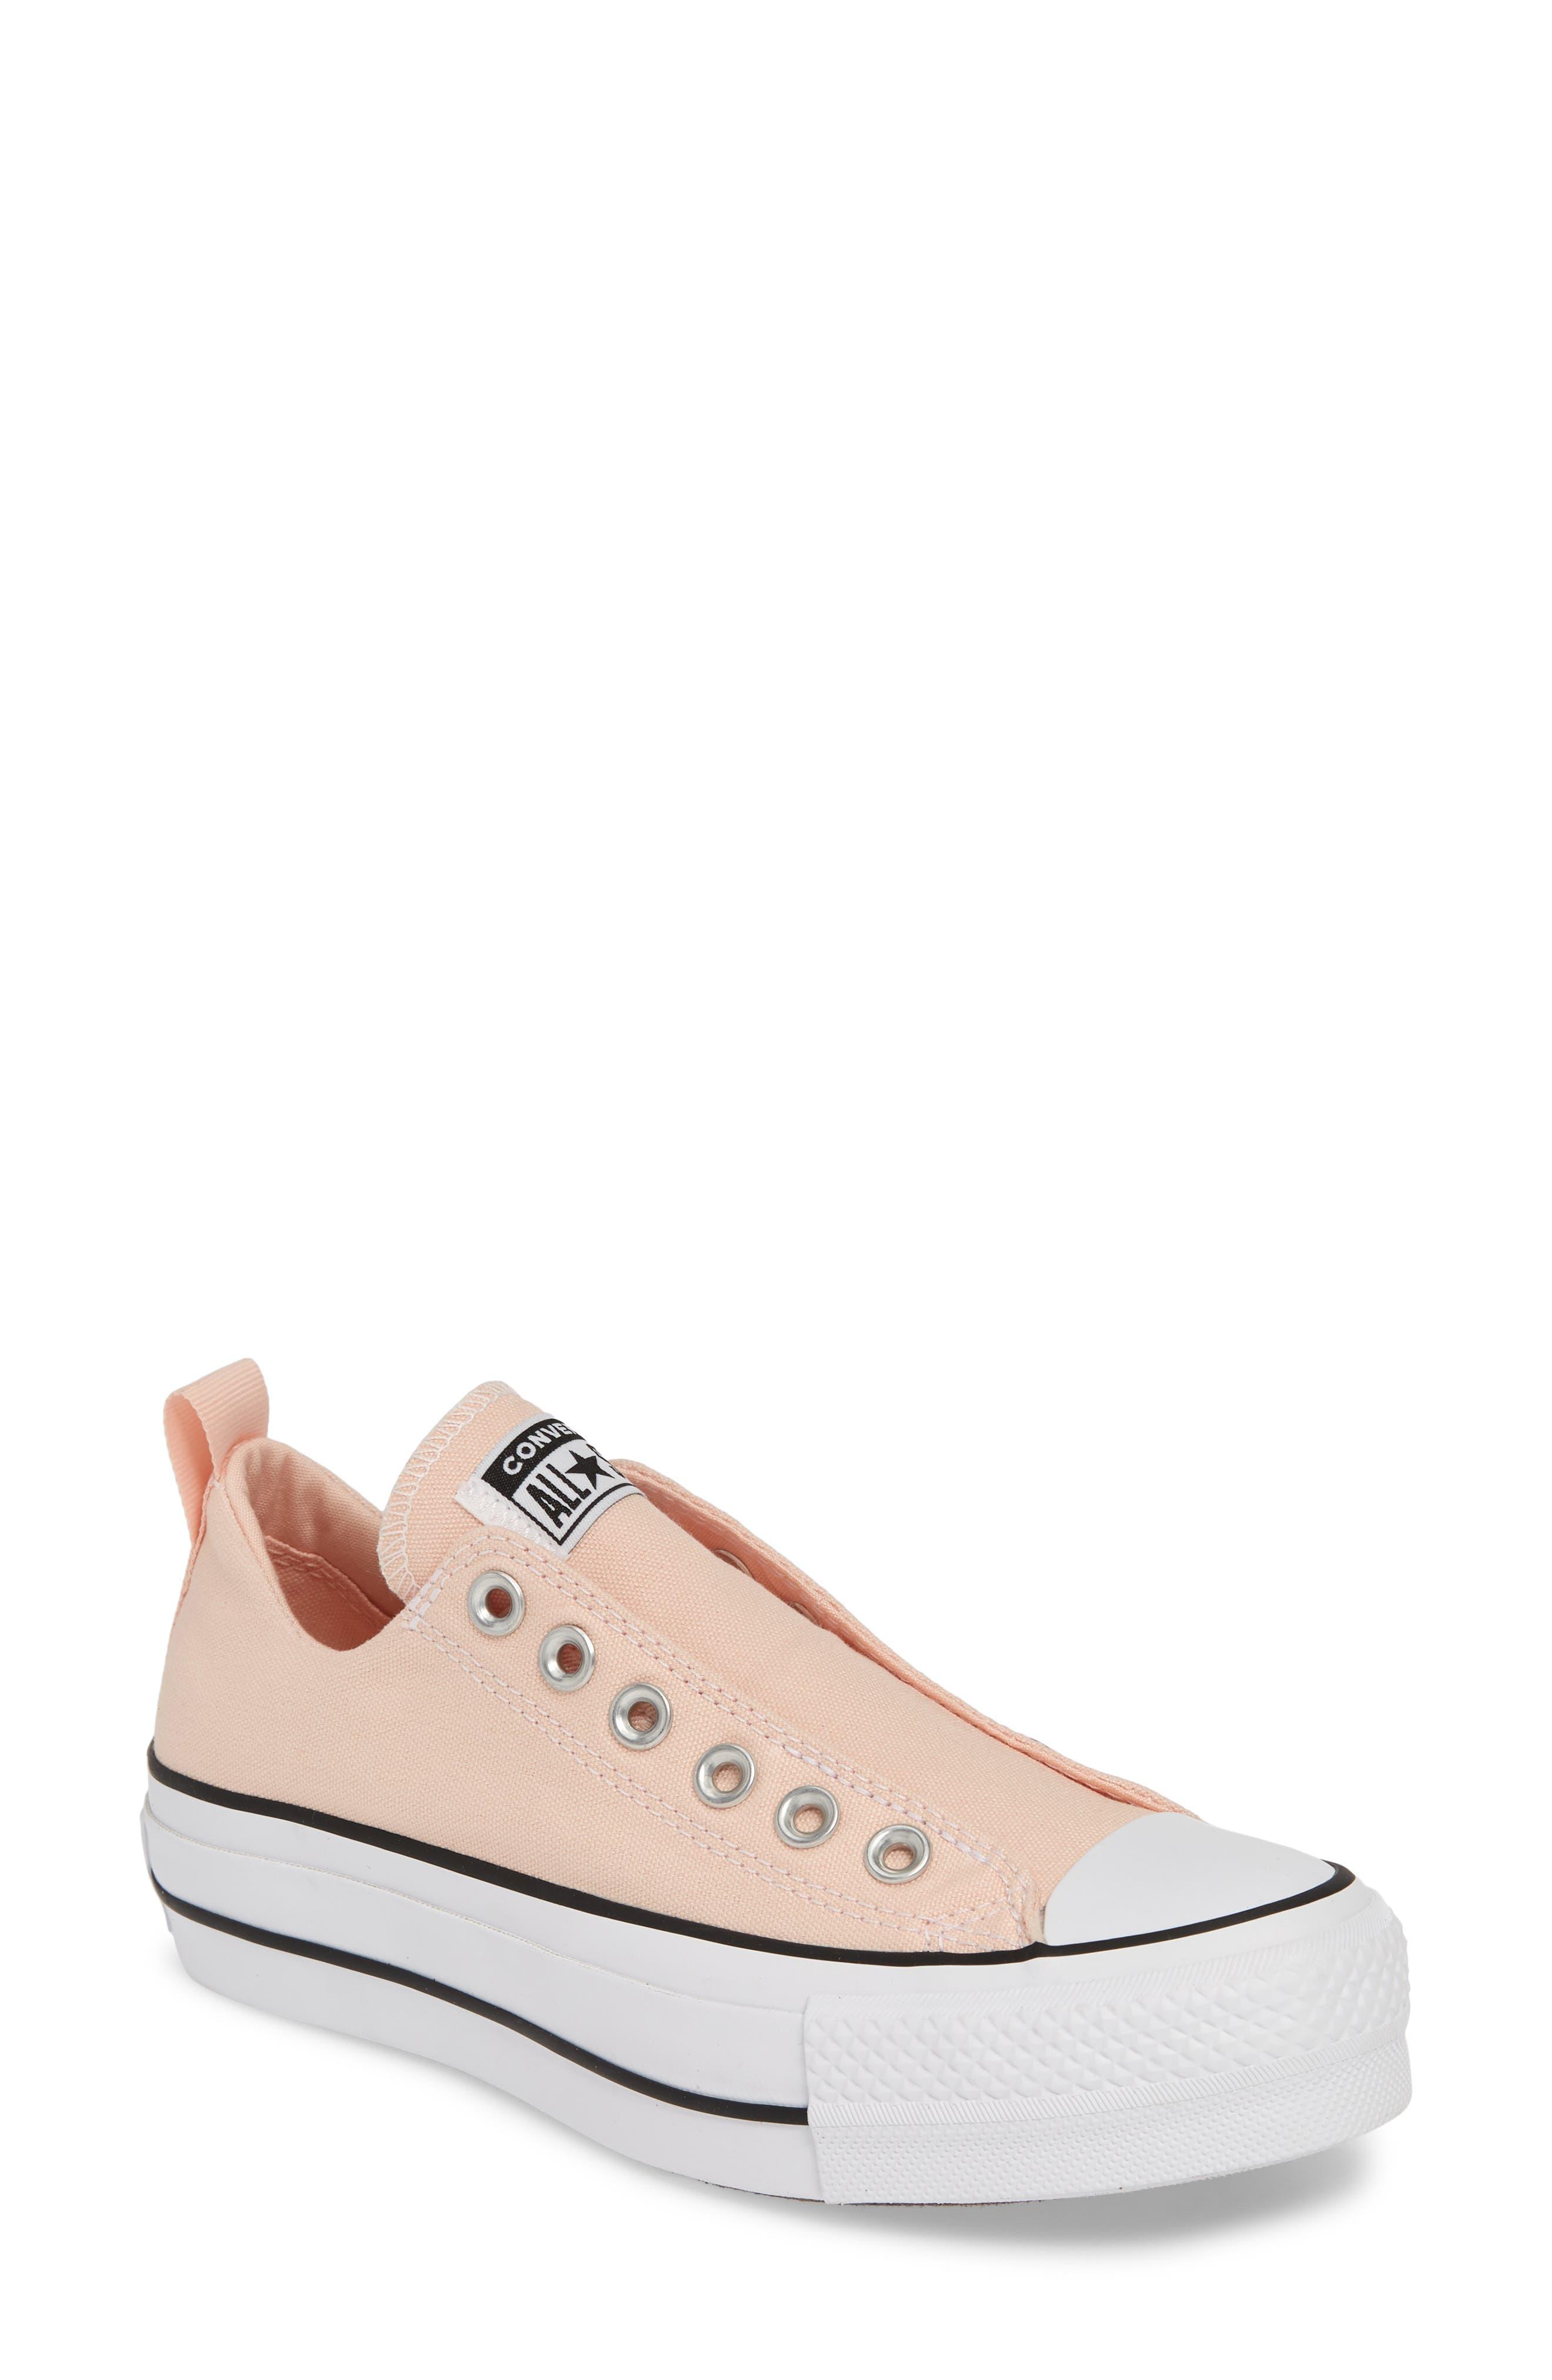 Converse Chuck Taylor All Star Lift Slip-On Sneaker, Pink